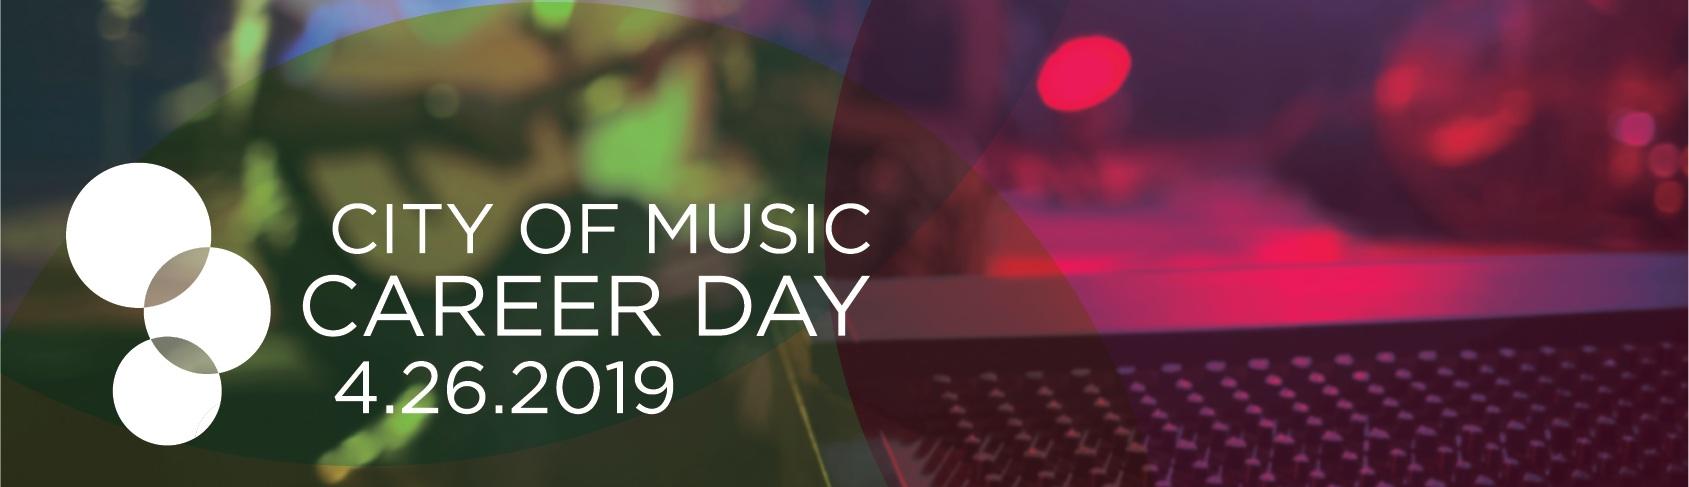 music_careerday_2019-05.jpg